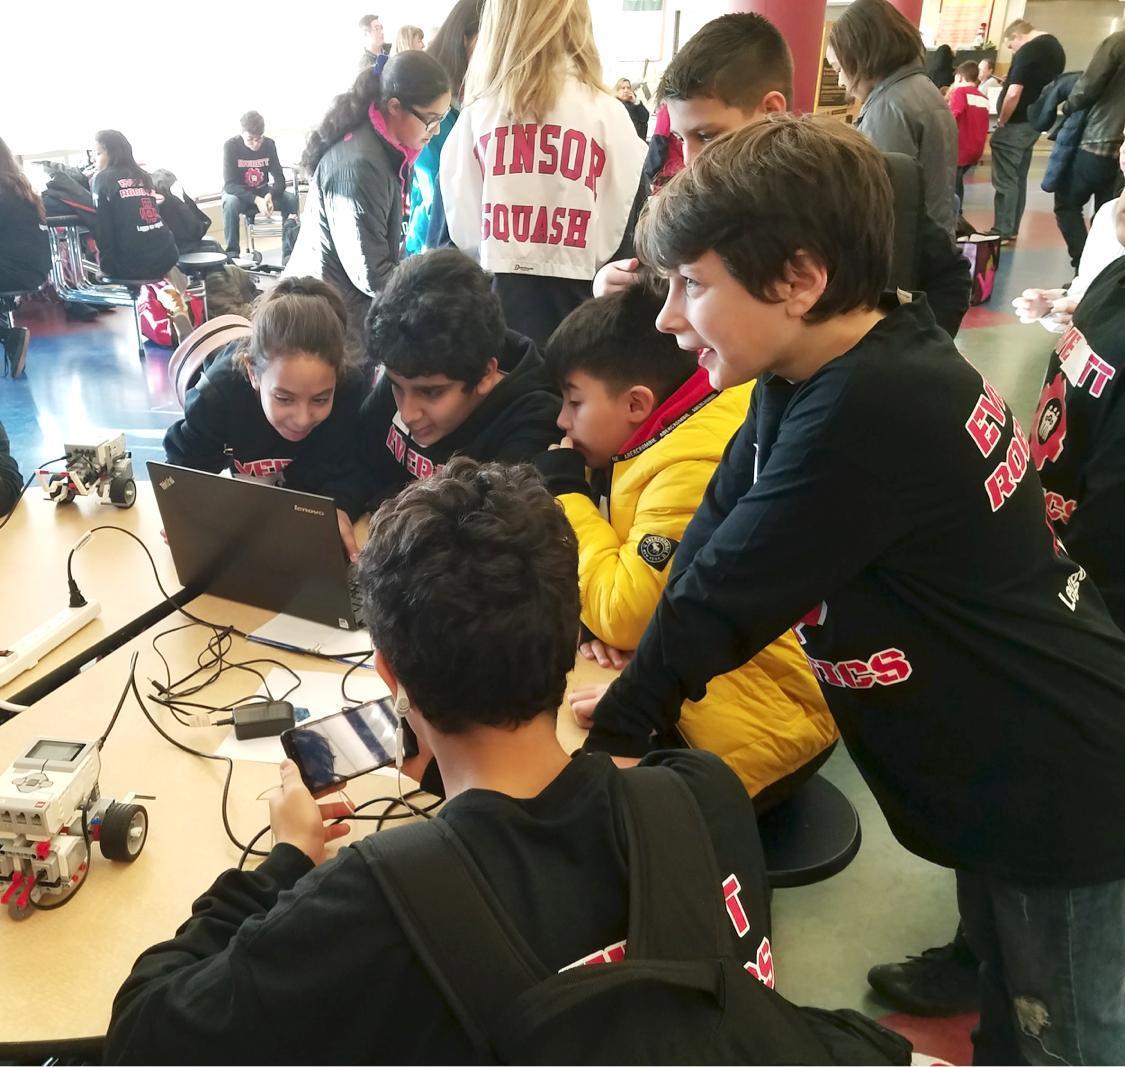 Three students huddle around a laptop